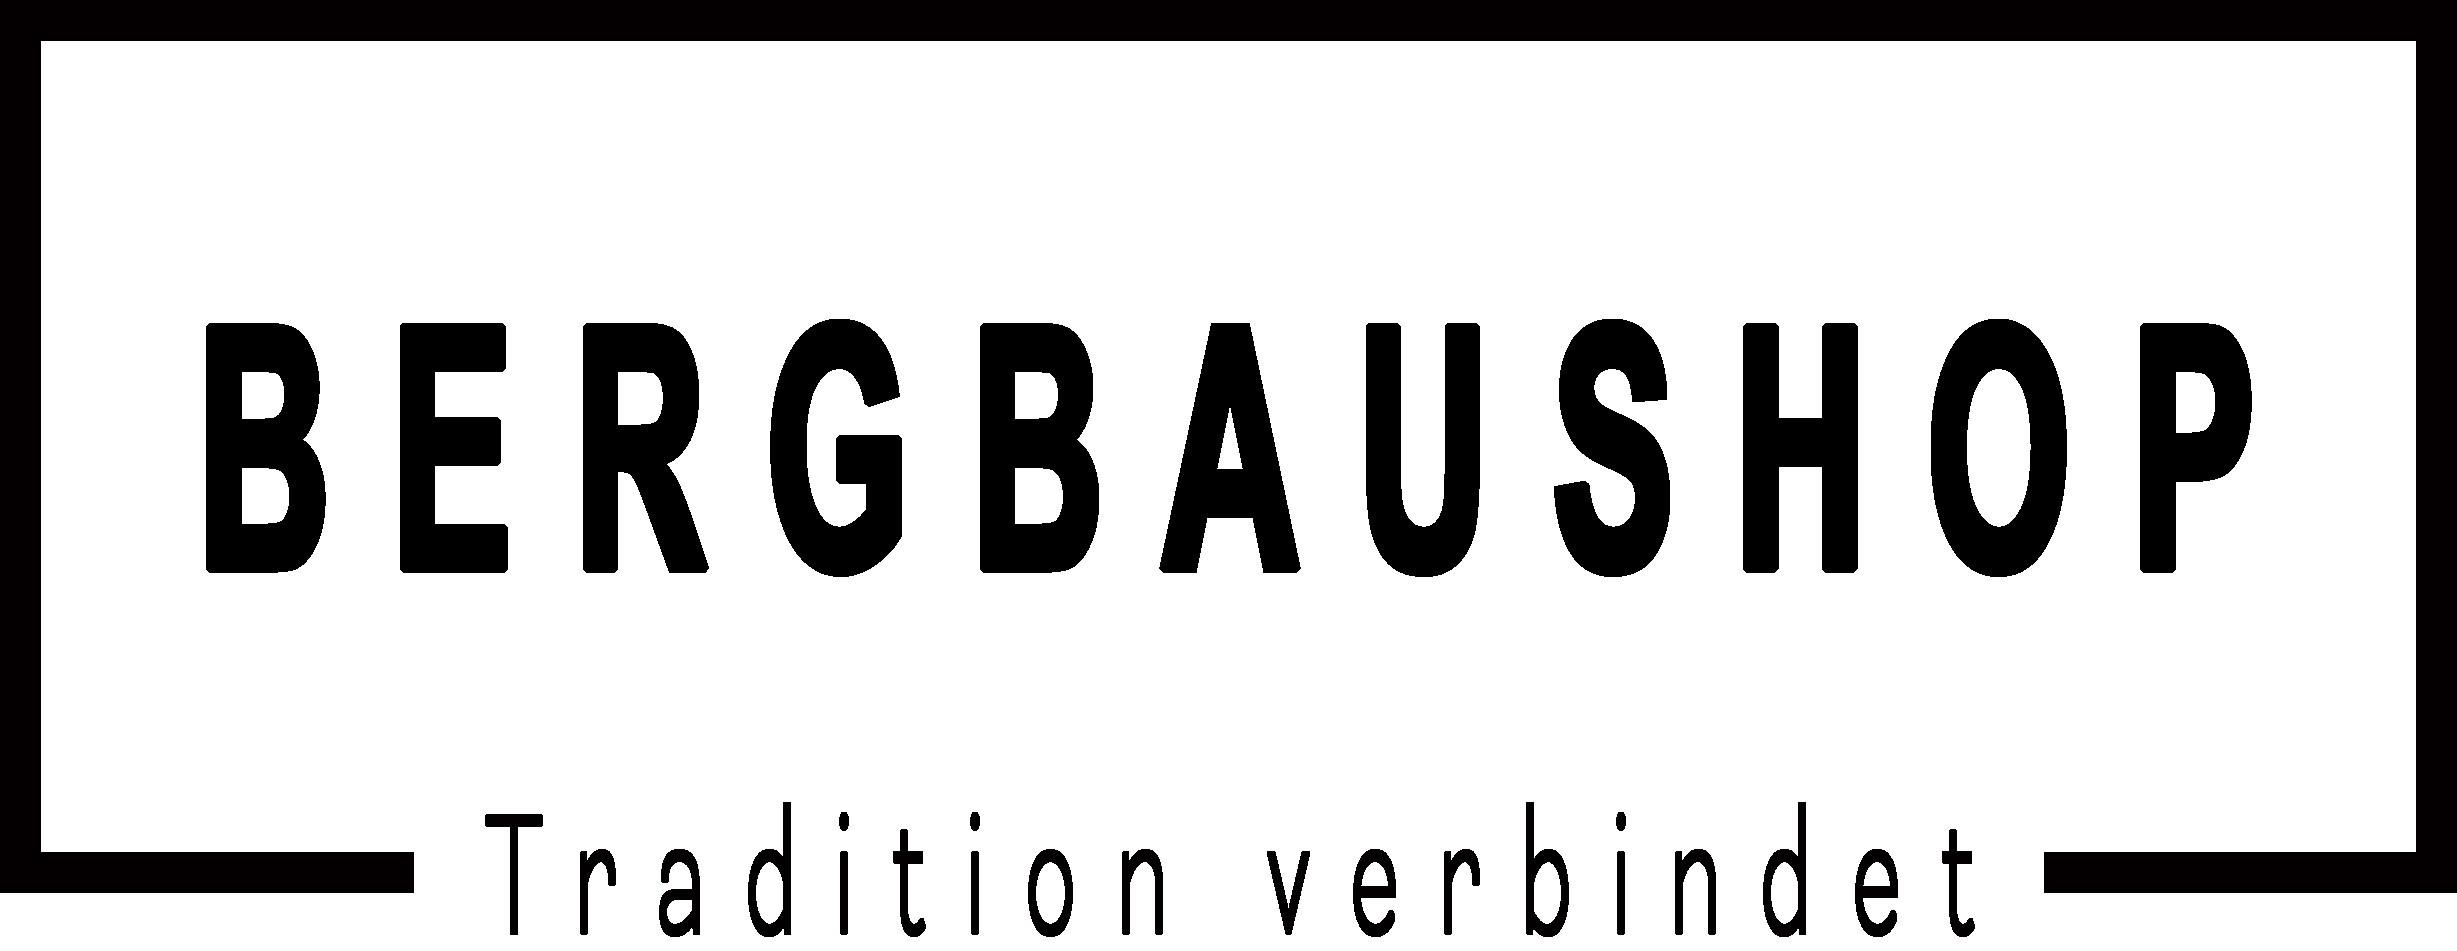 Bergbaushop.de